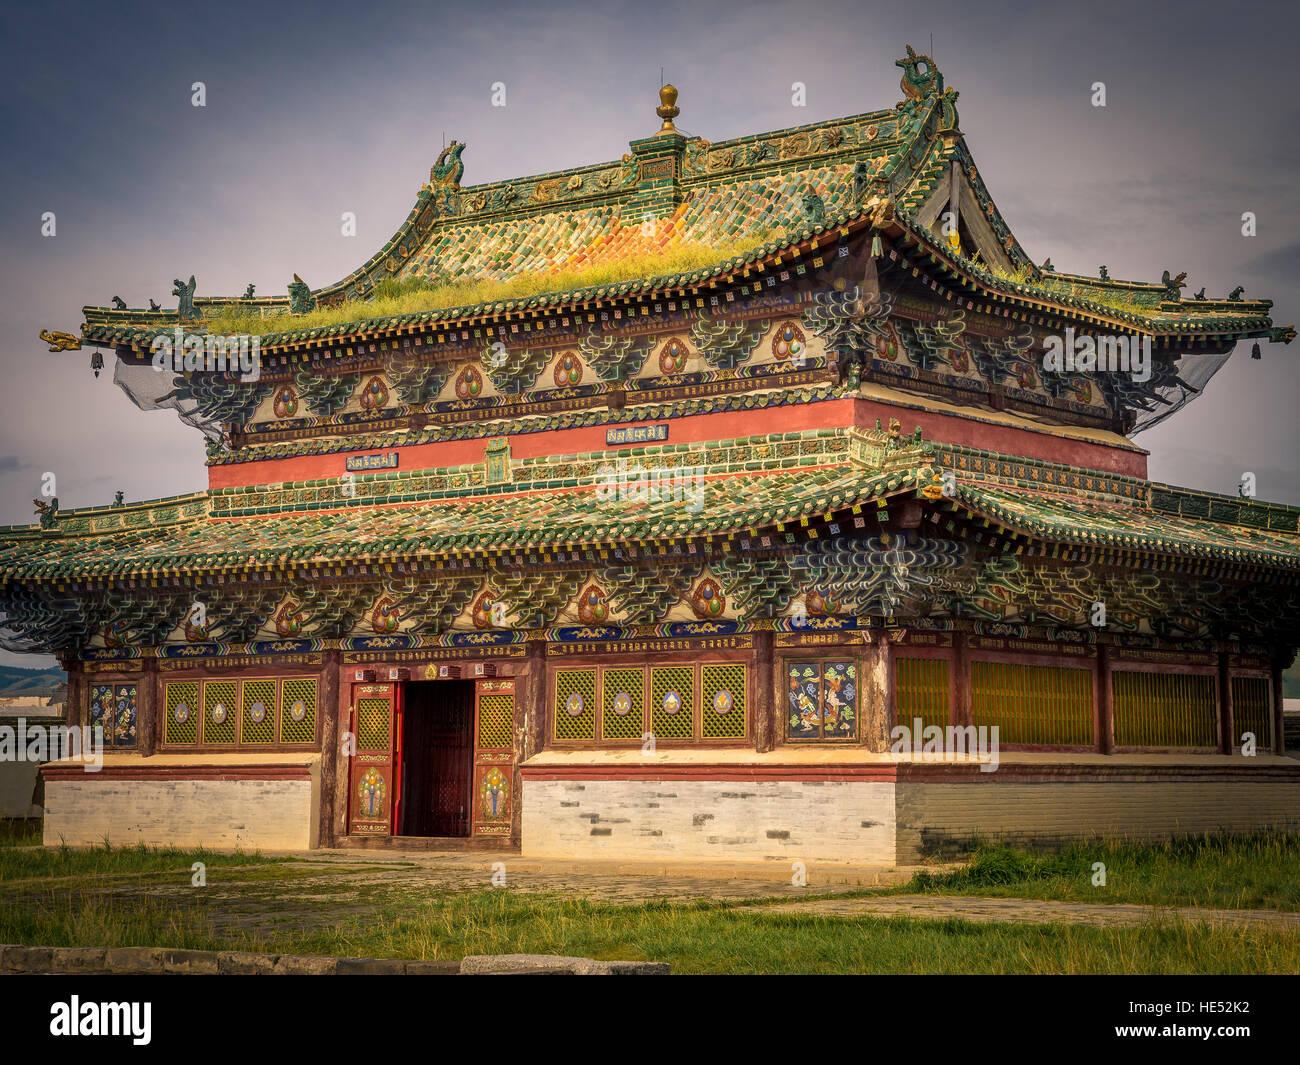 Temple at Erdene Zuu monastery, Karakorum, Kharkhorin, Övörkhangai Province, Mongolia - Stock Image